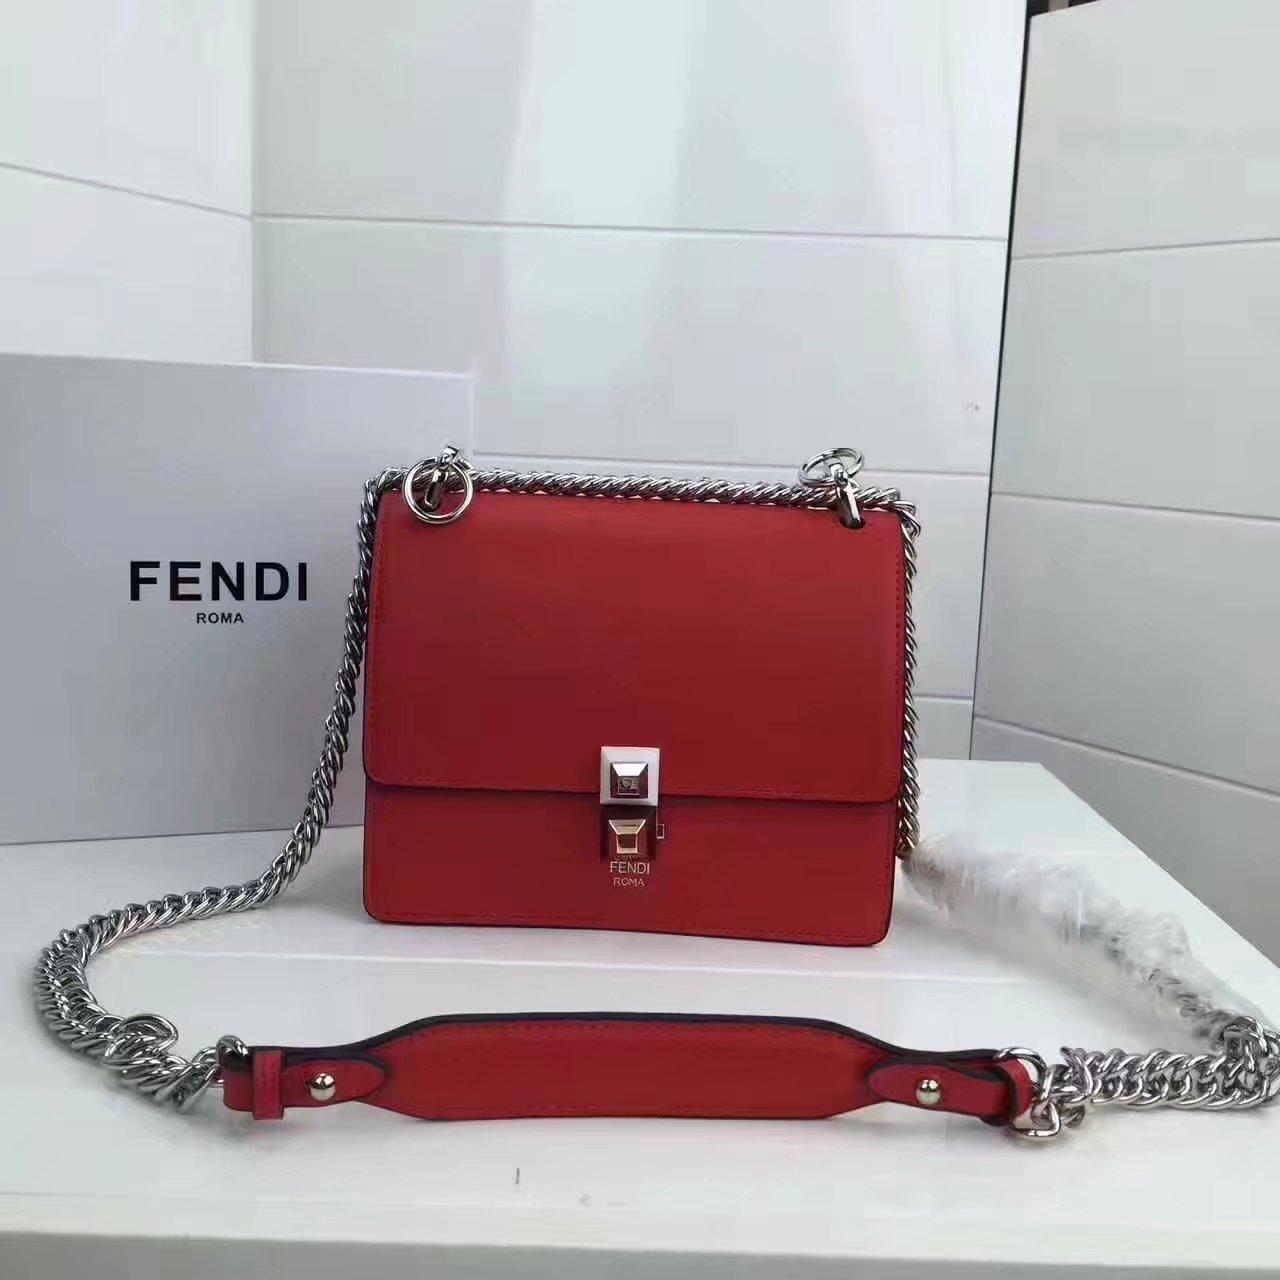 Fendi Small Kan I Red Leather Mini Bag